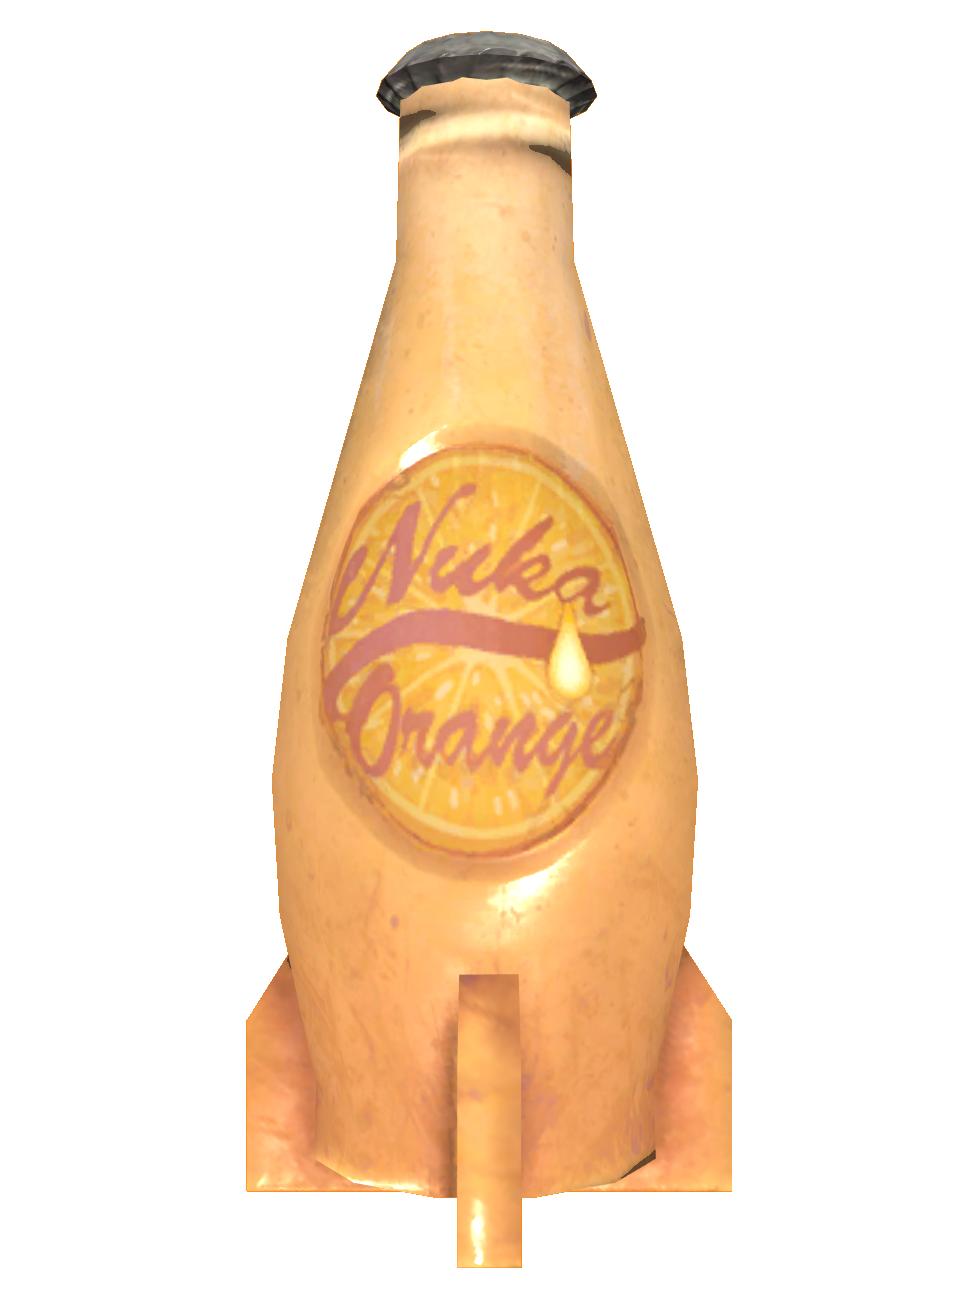 ice cold nuka cola orange fallout wiki fandom powered by wikia